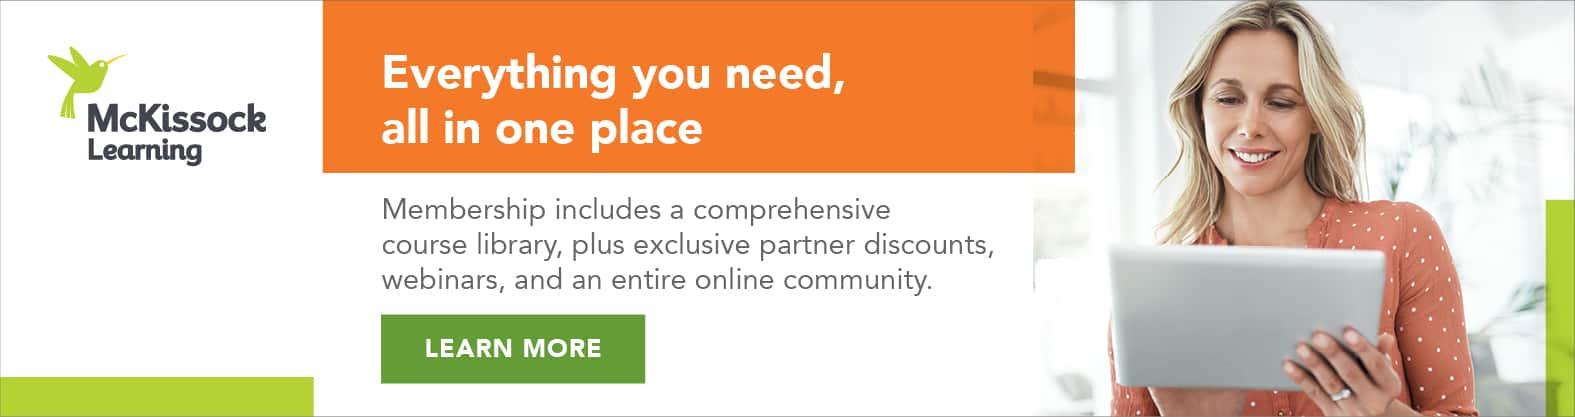 McKissock Appraisal Unlimited Learning Membership